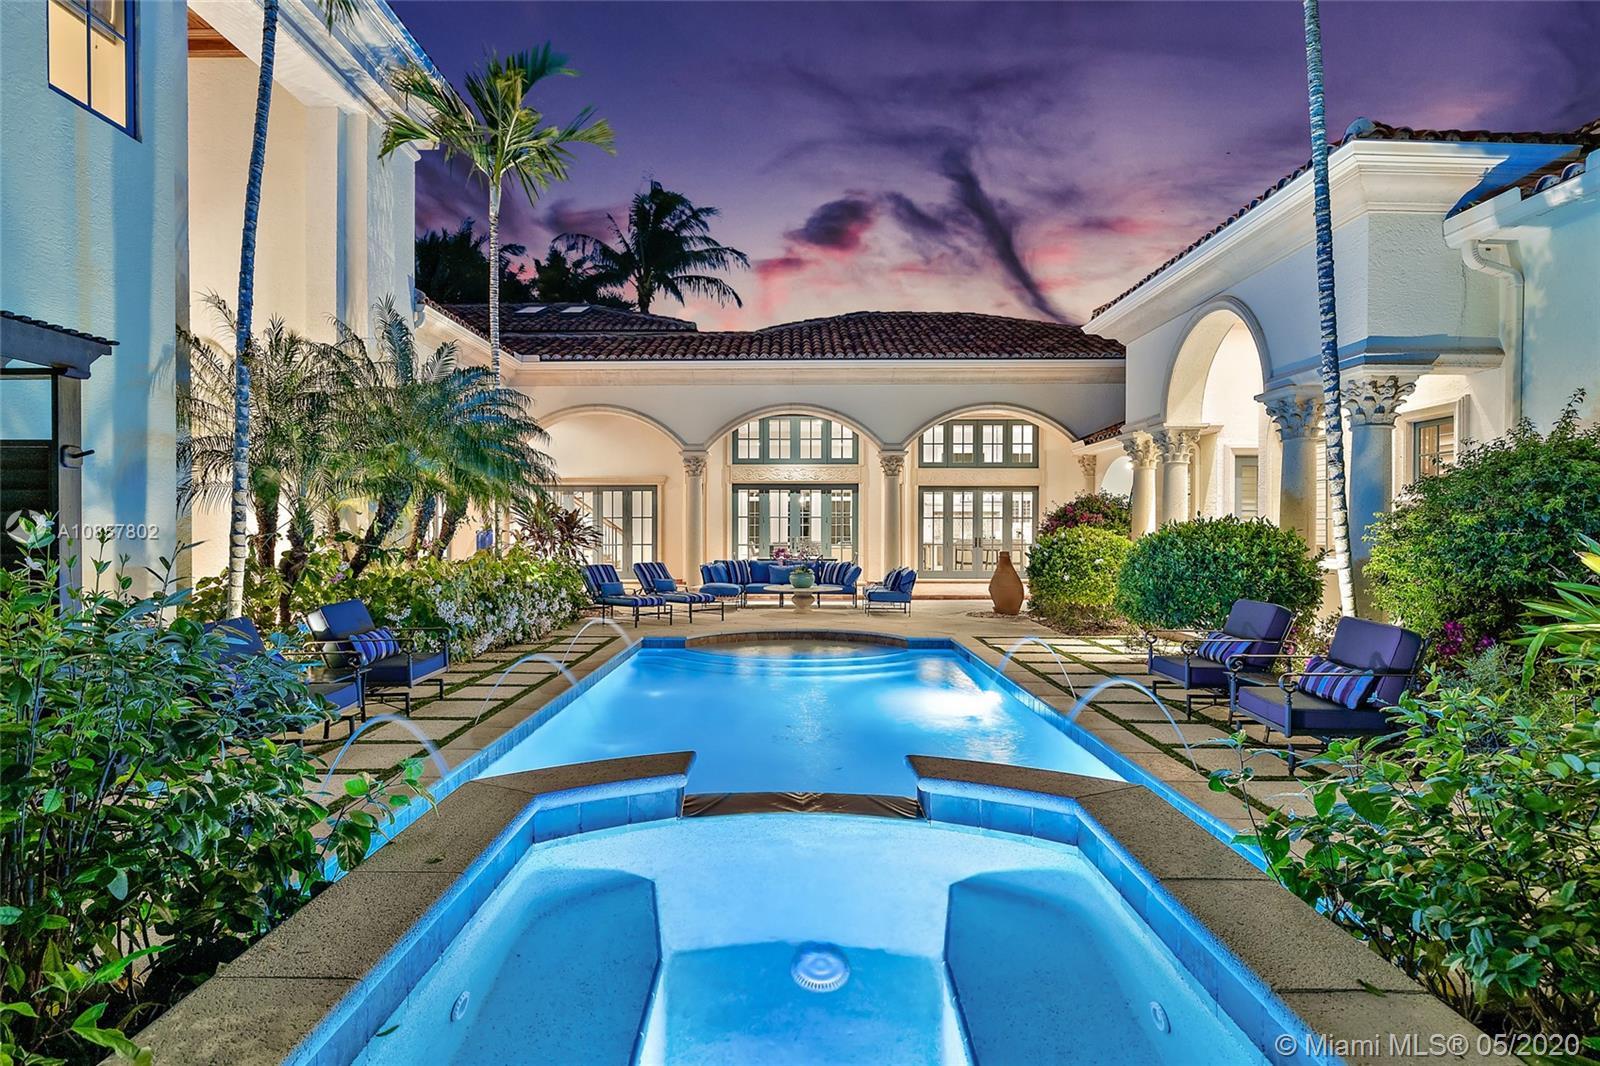 406 Mariner Dr Luxury Real Estate